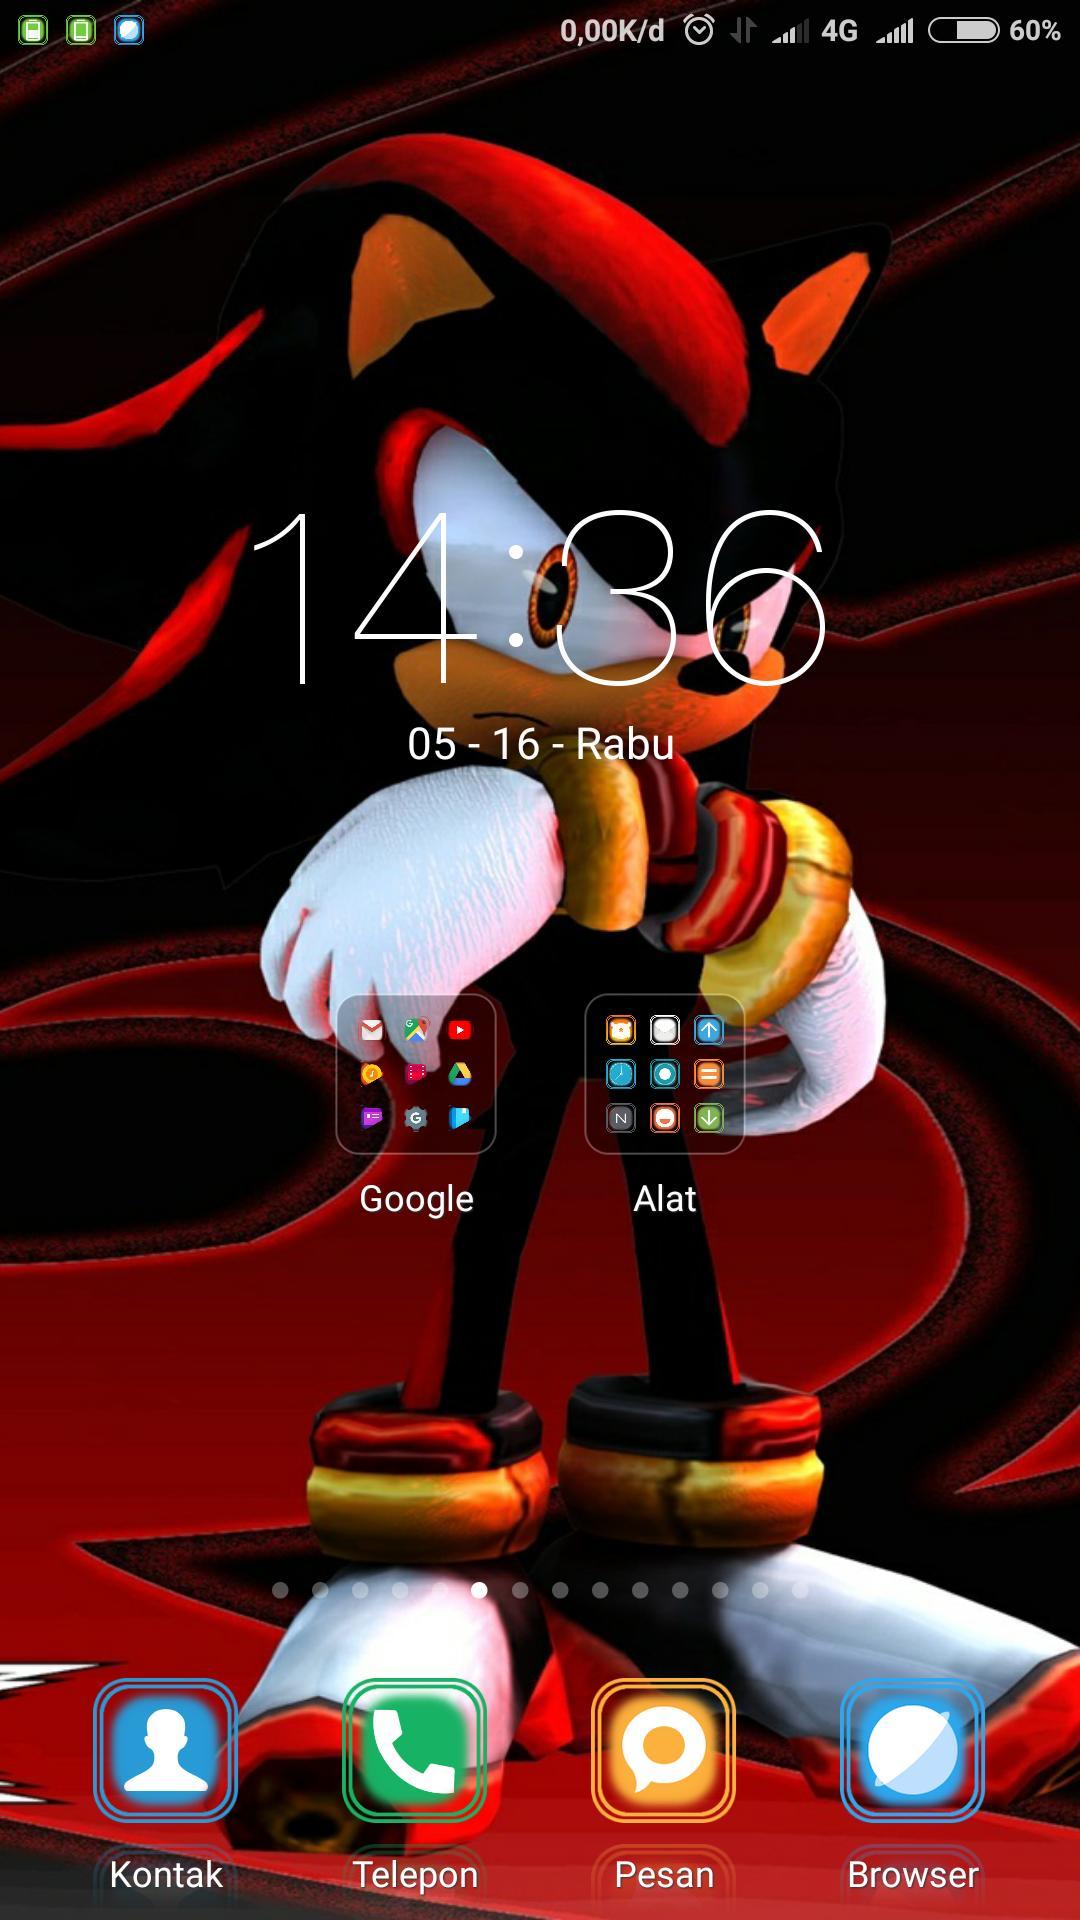 Android 用の Shadow Hedgehog Art Wallpaper Apk をダウンロード